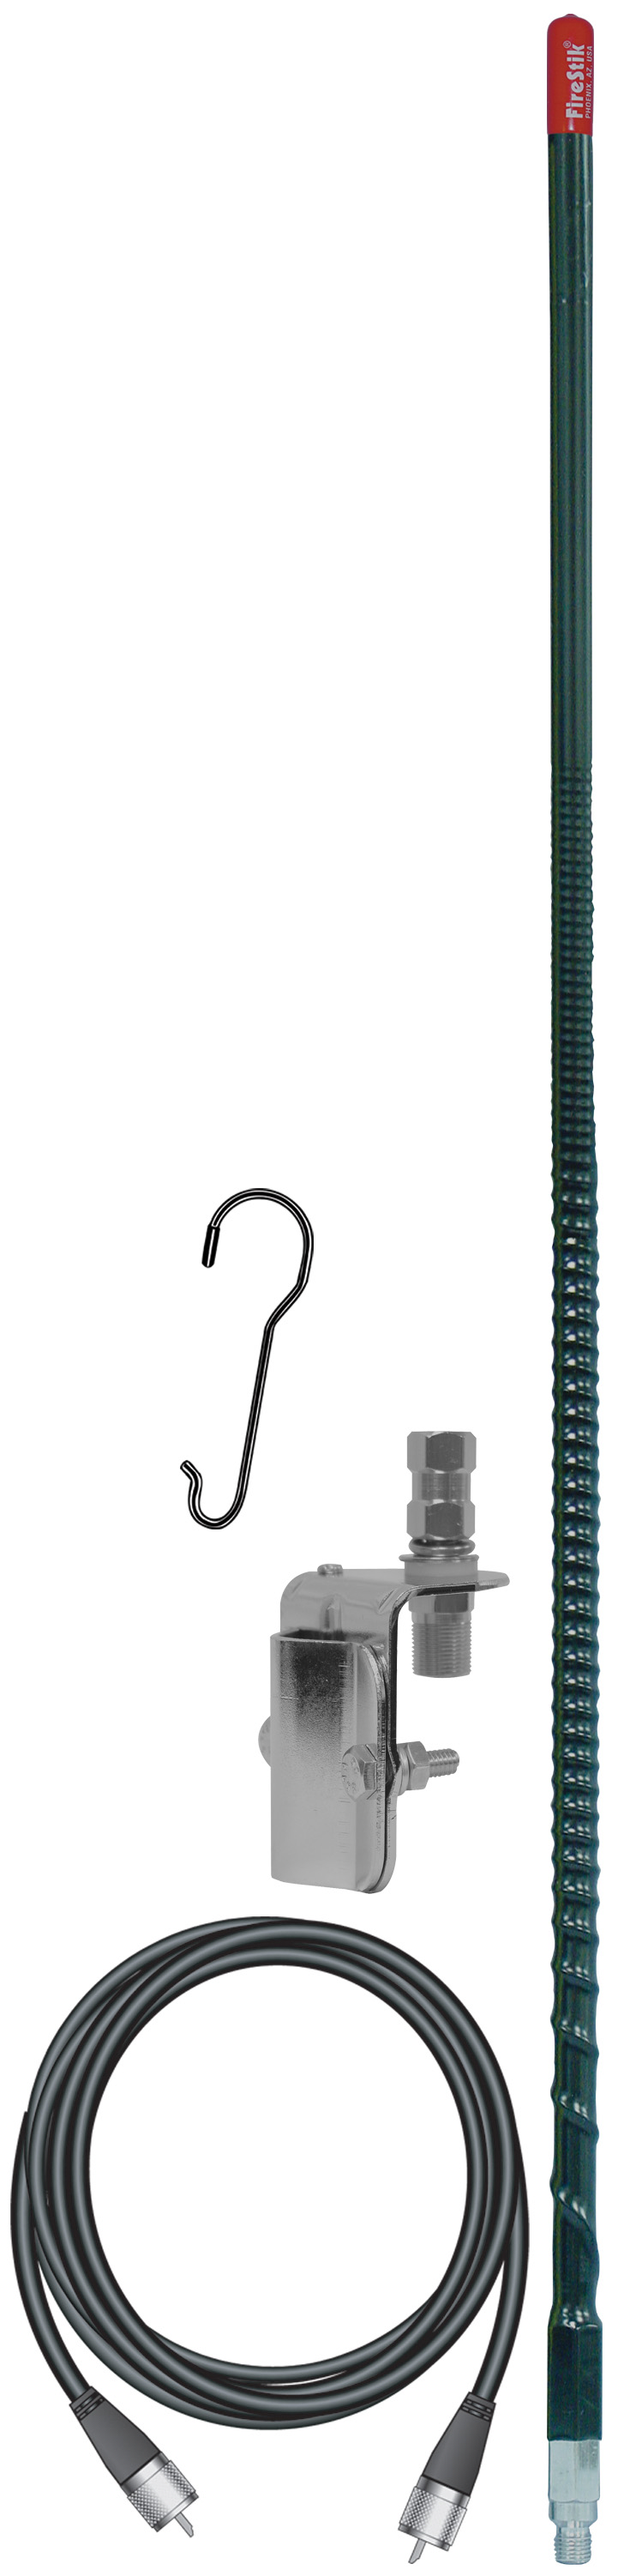 KW3SMK-B - Firestik 3' Single Mirror Mount CB Antenna Kit (Black)